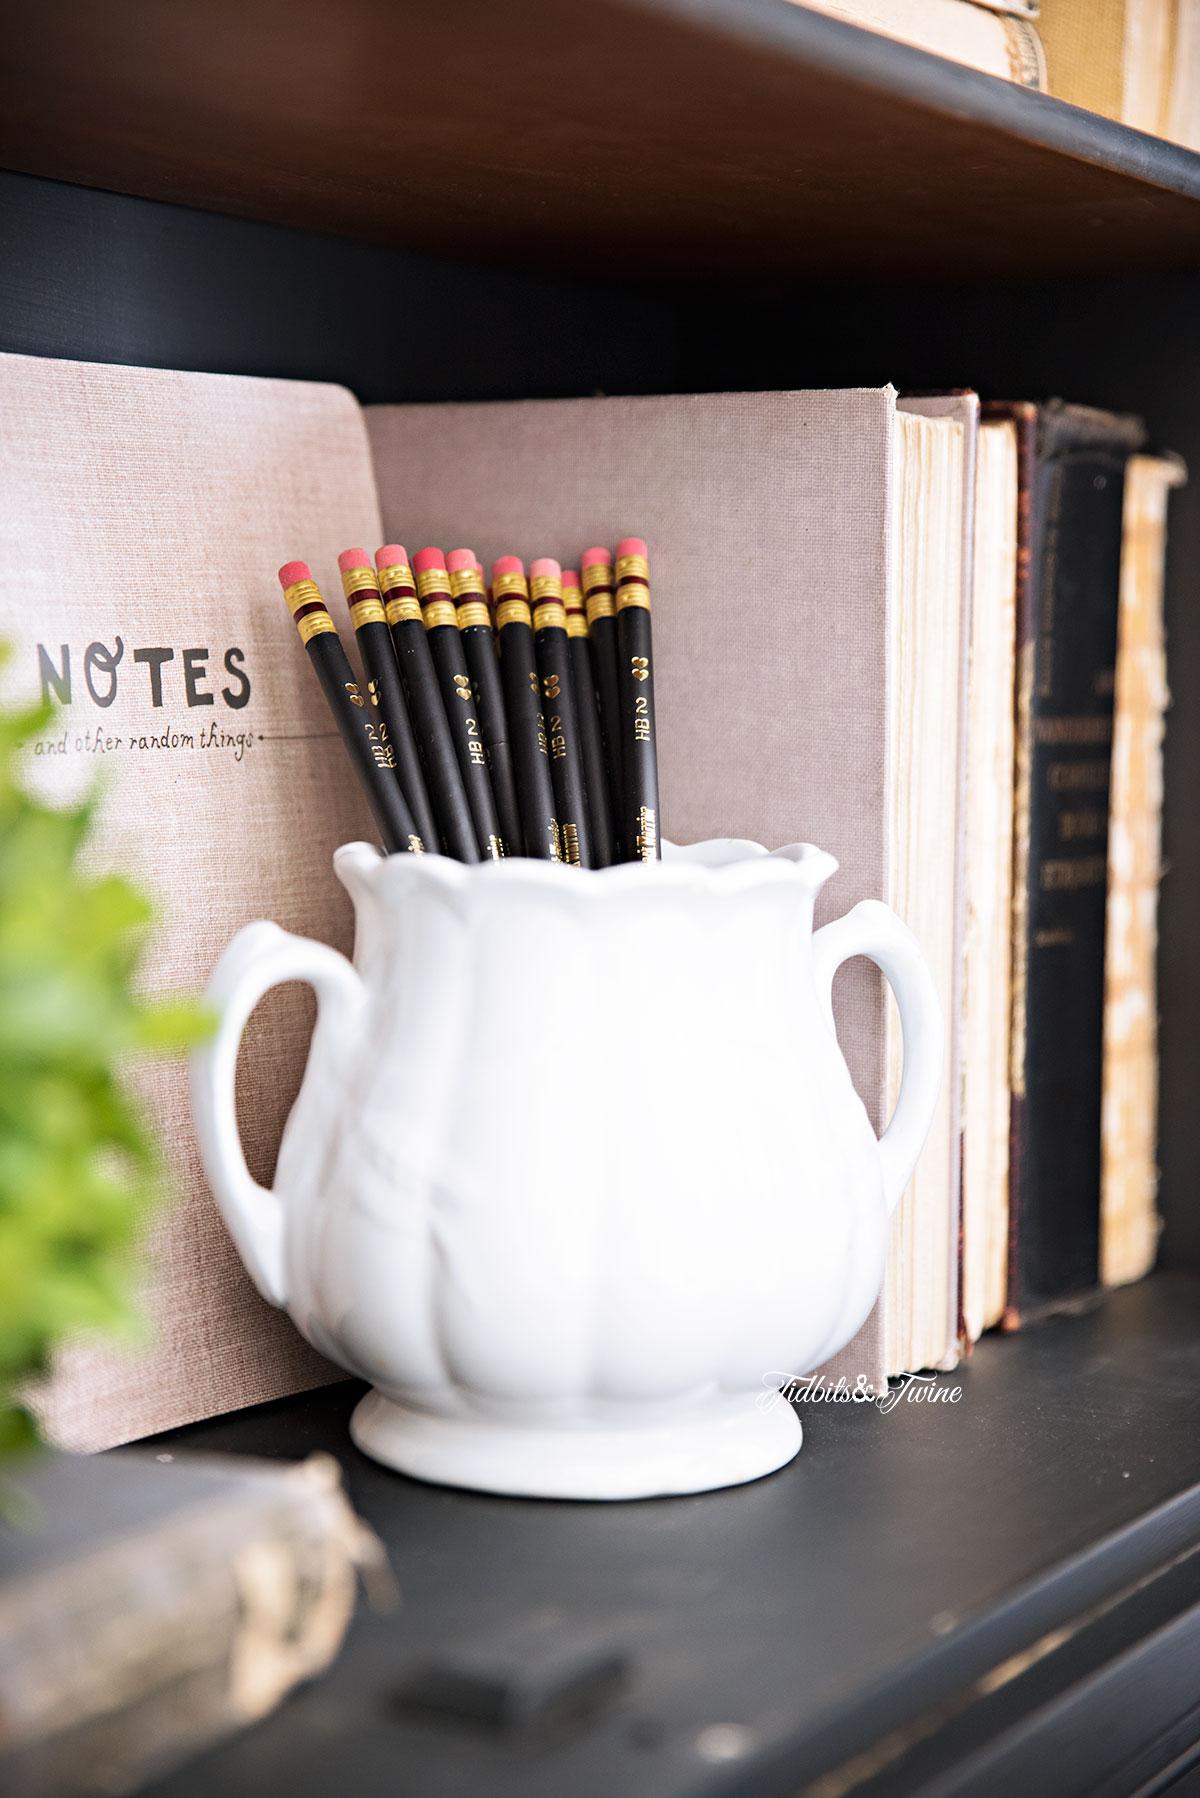 Tidbits&Twine Ironstone Sugar Pot and Vintage Books